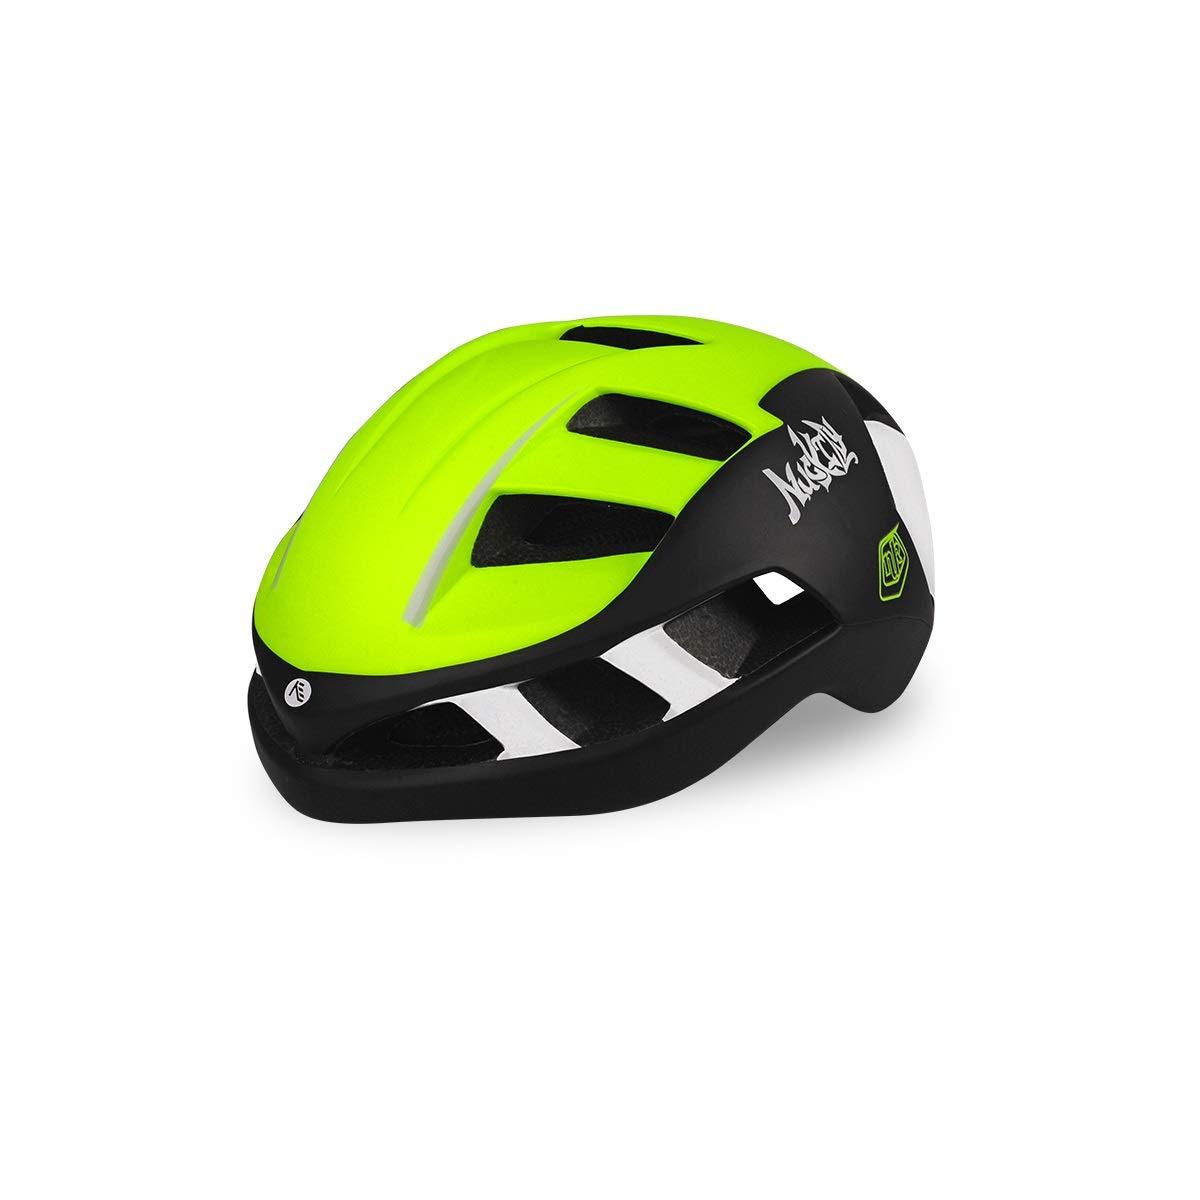 8hawoenju Bike Helmet with in-Molded Reinforcing Skeleton for Added Protection - Adult Size, Comfortable, Lightweight, Breathable (Color : Light Green, Size : L)